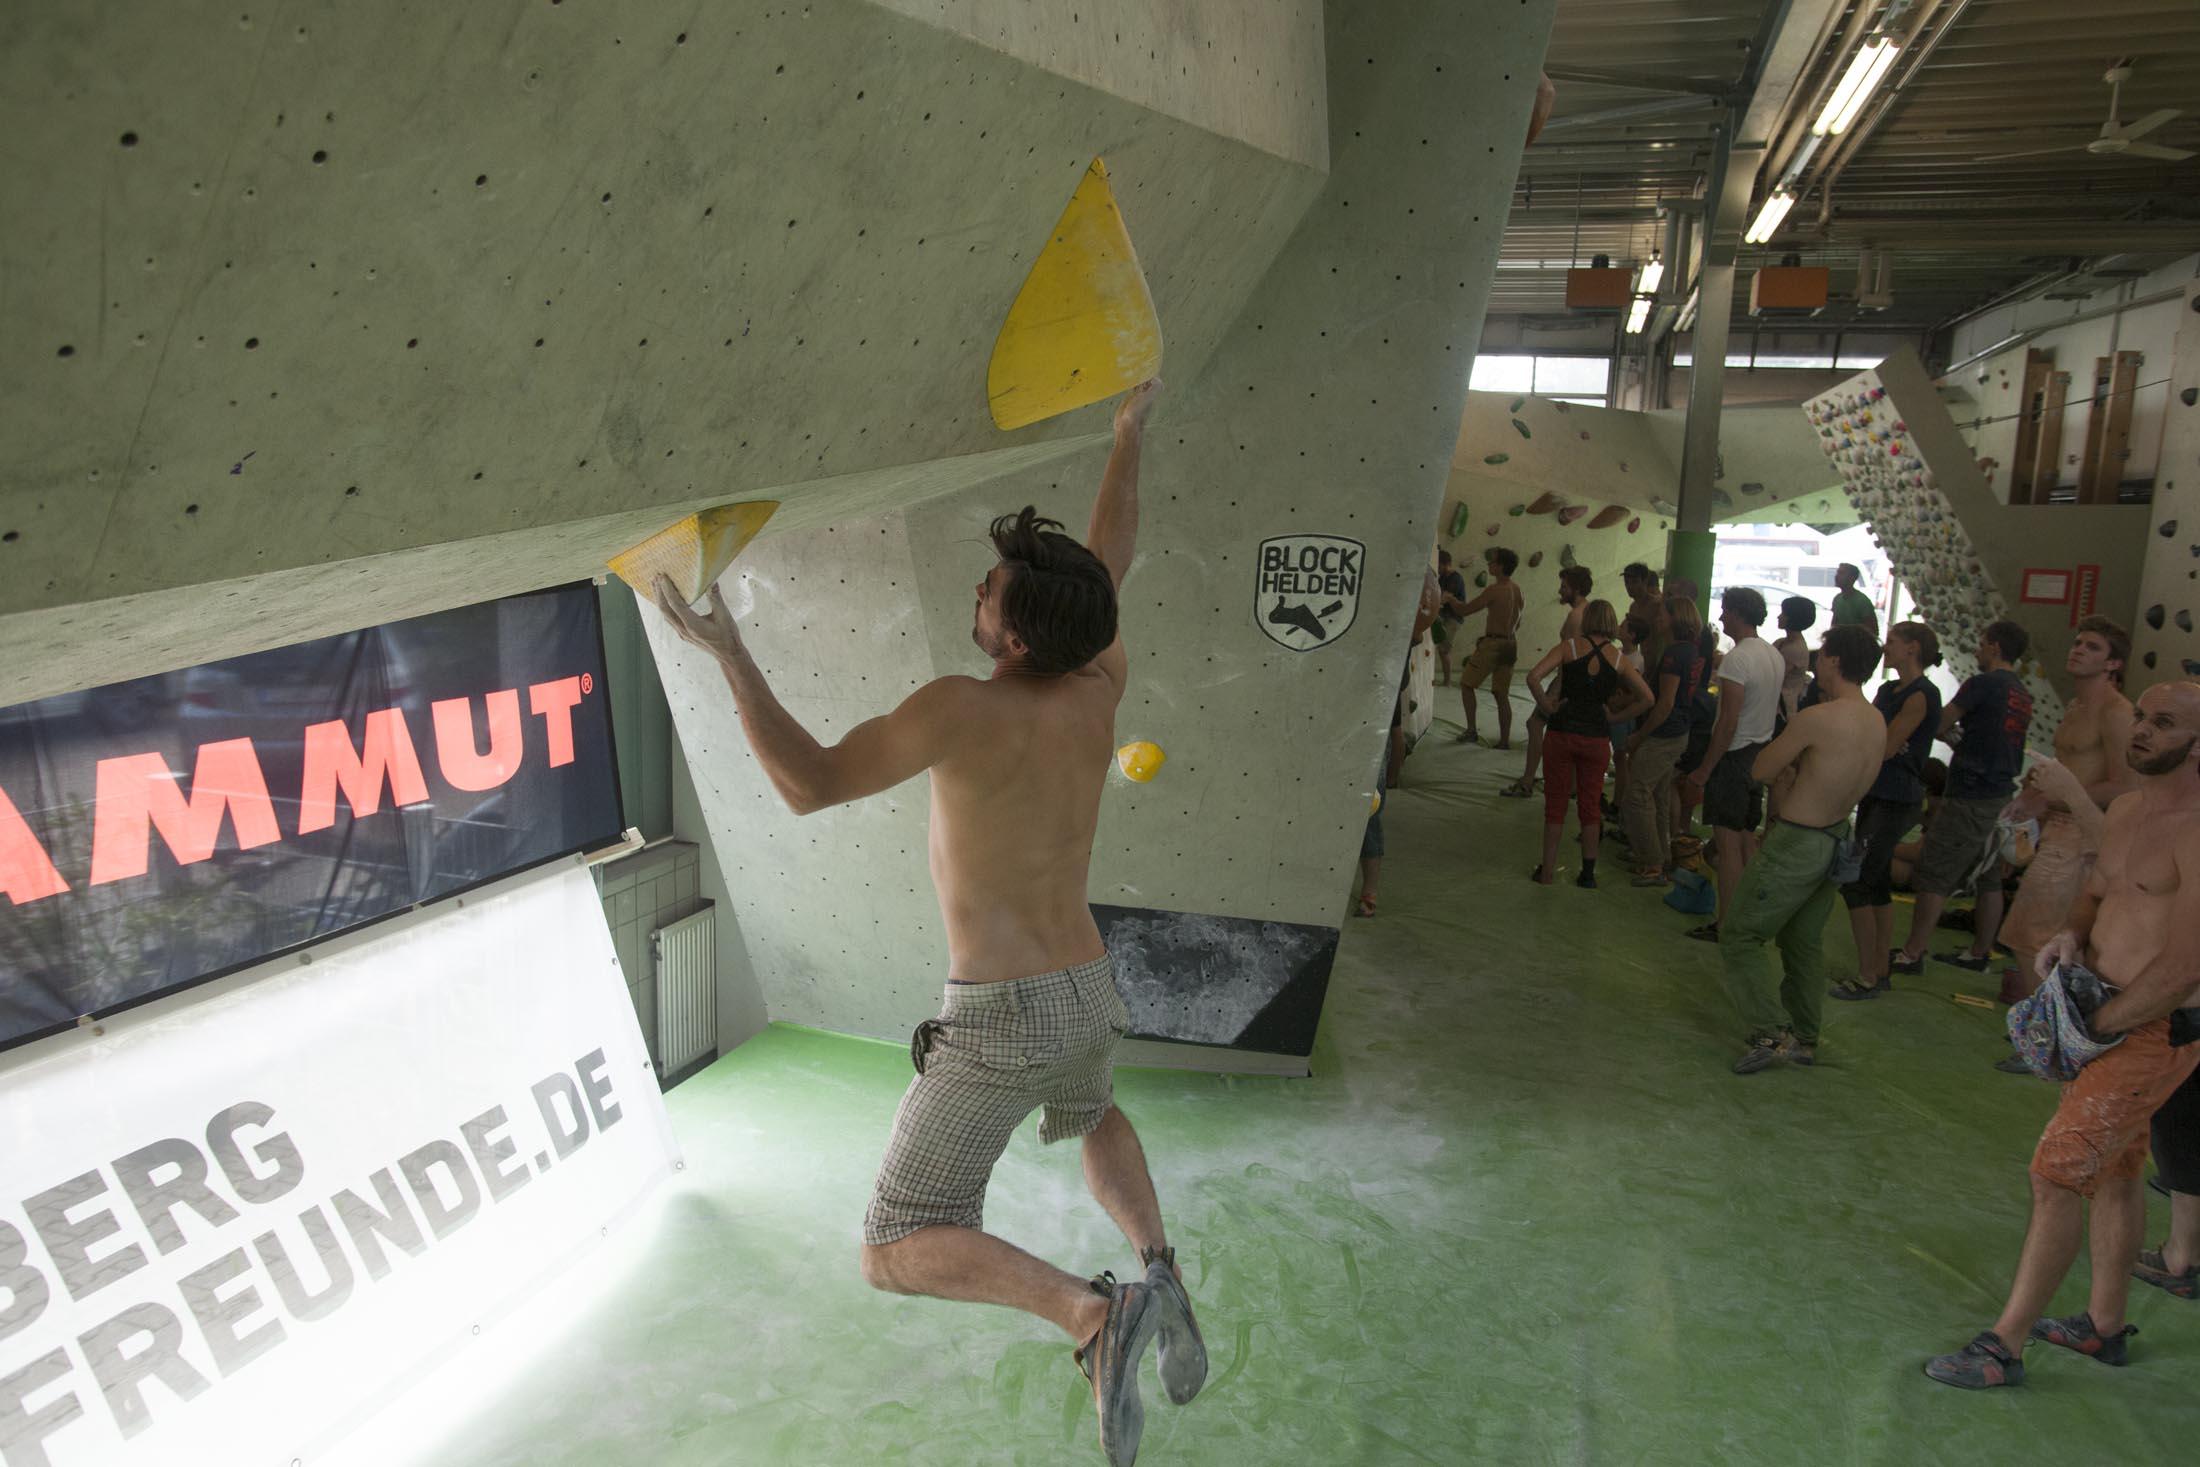 Quali, internationaler bouldercup Frankenjura 2016, BLOCKHELDEN Erlangen, Mammut, Bergfreunde.de, Boulderwettkampf07092016394